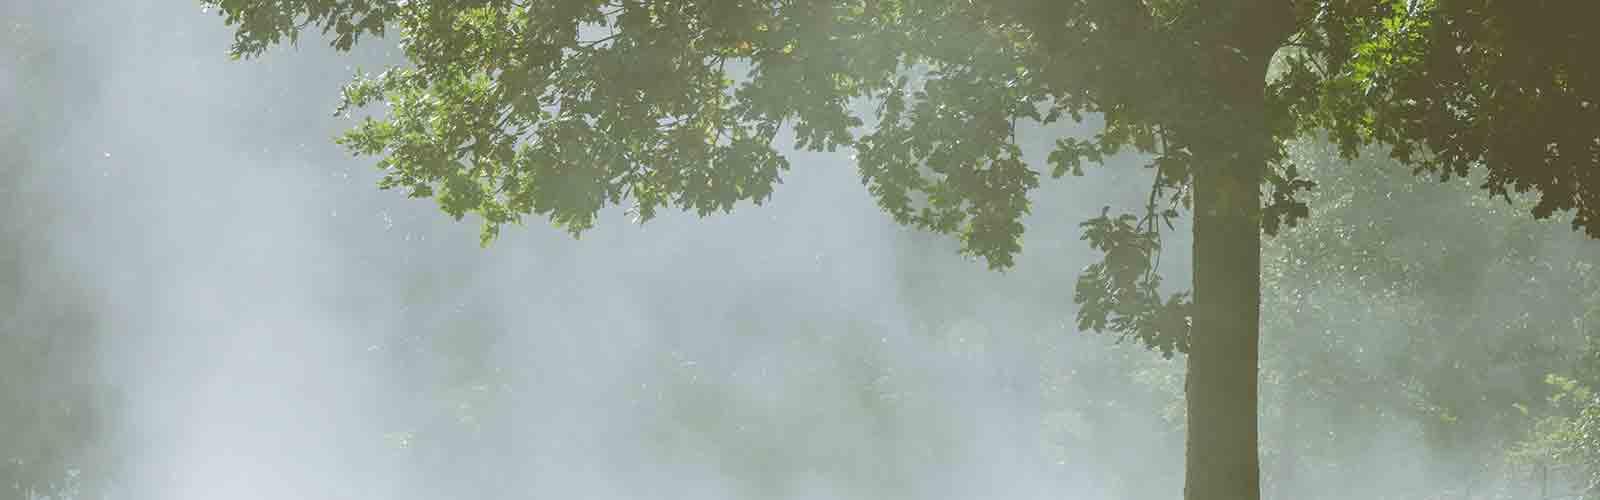 Baumpflege Rohrbeck - Begutachtung von Bäumen